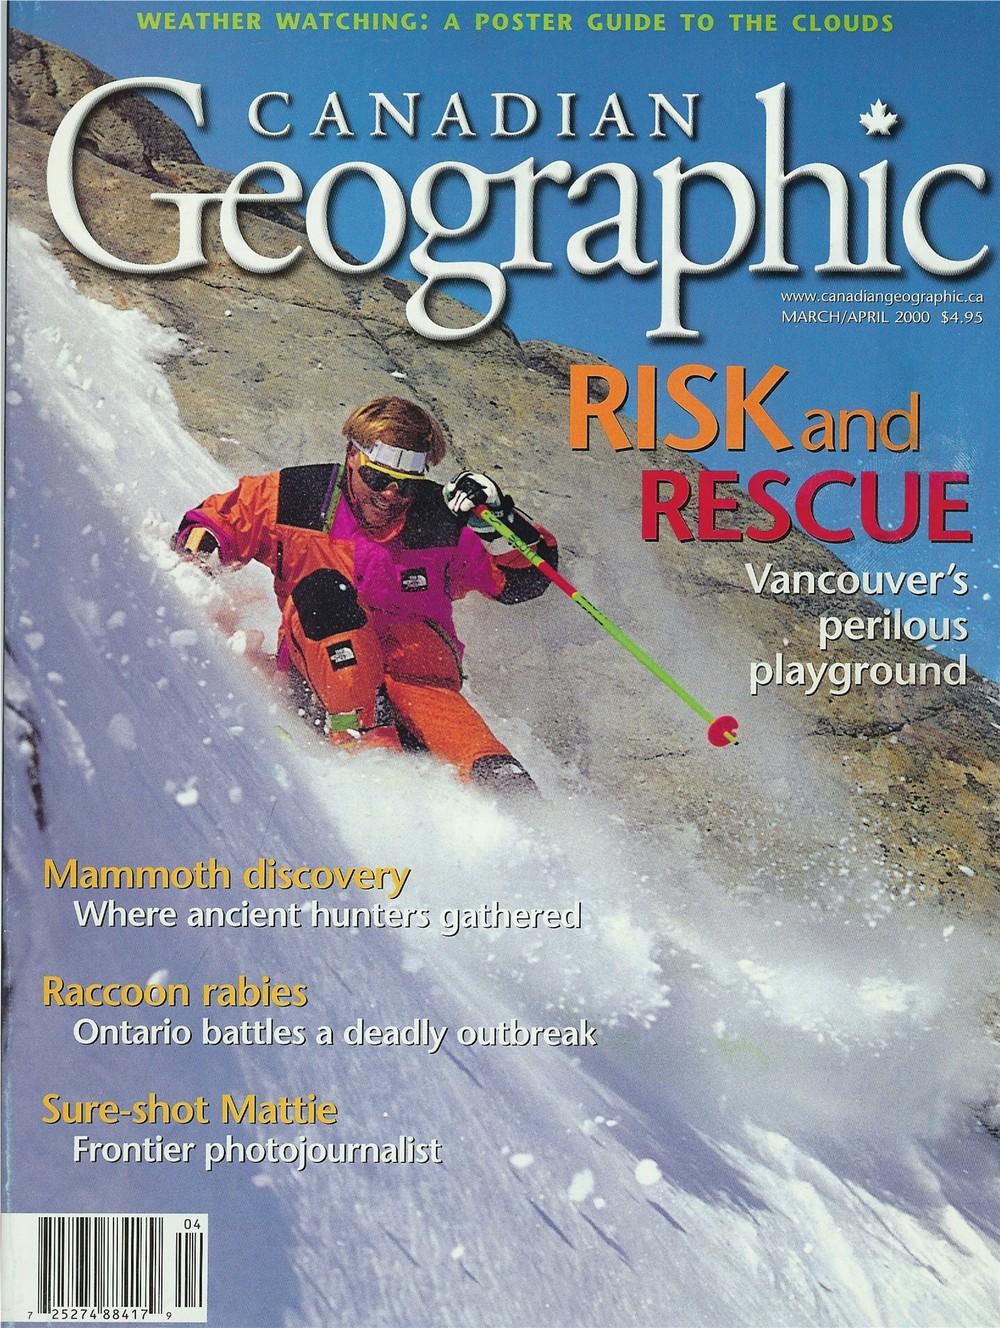 Magazine Cover16-Brad Vancour-2000.jpg